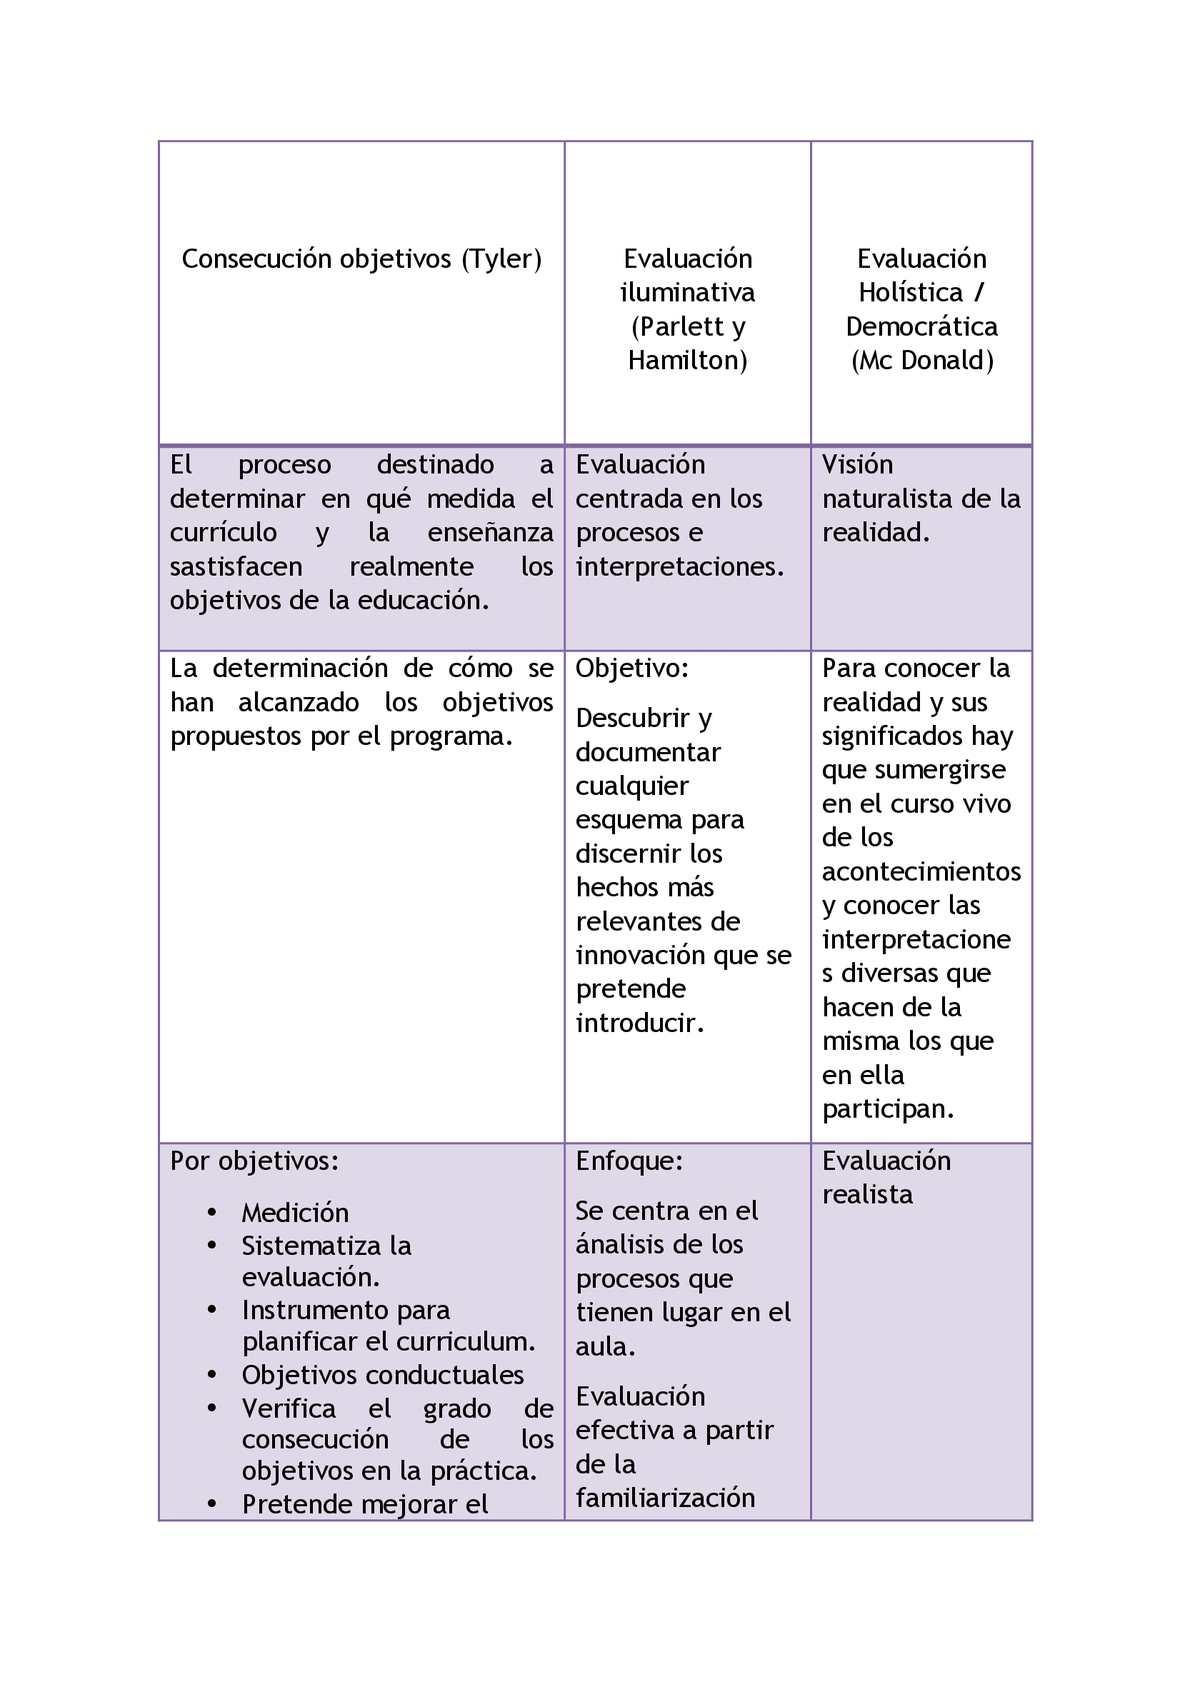 Calaméo - Modelos de evaluación educativa